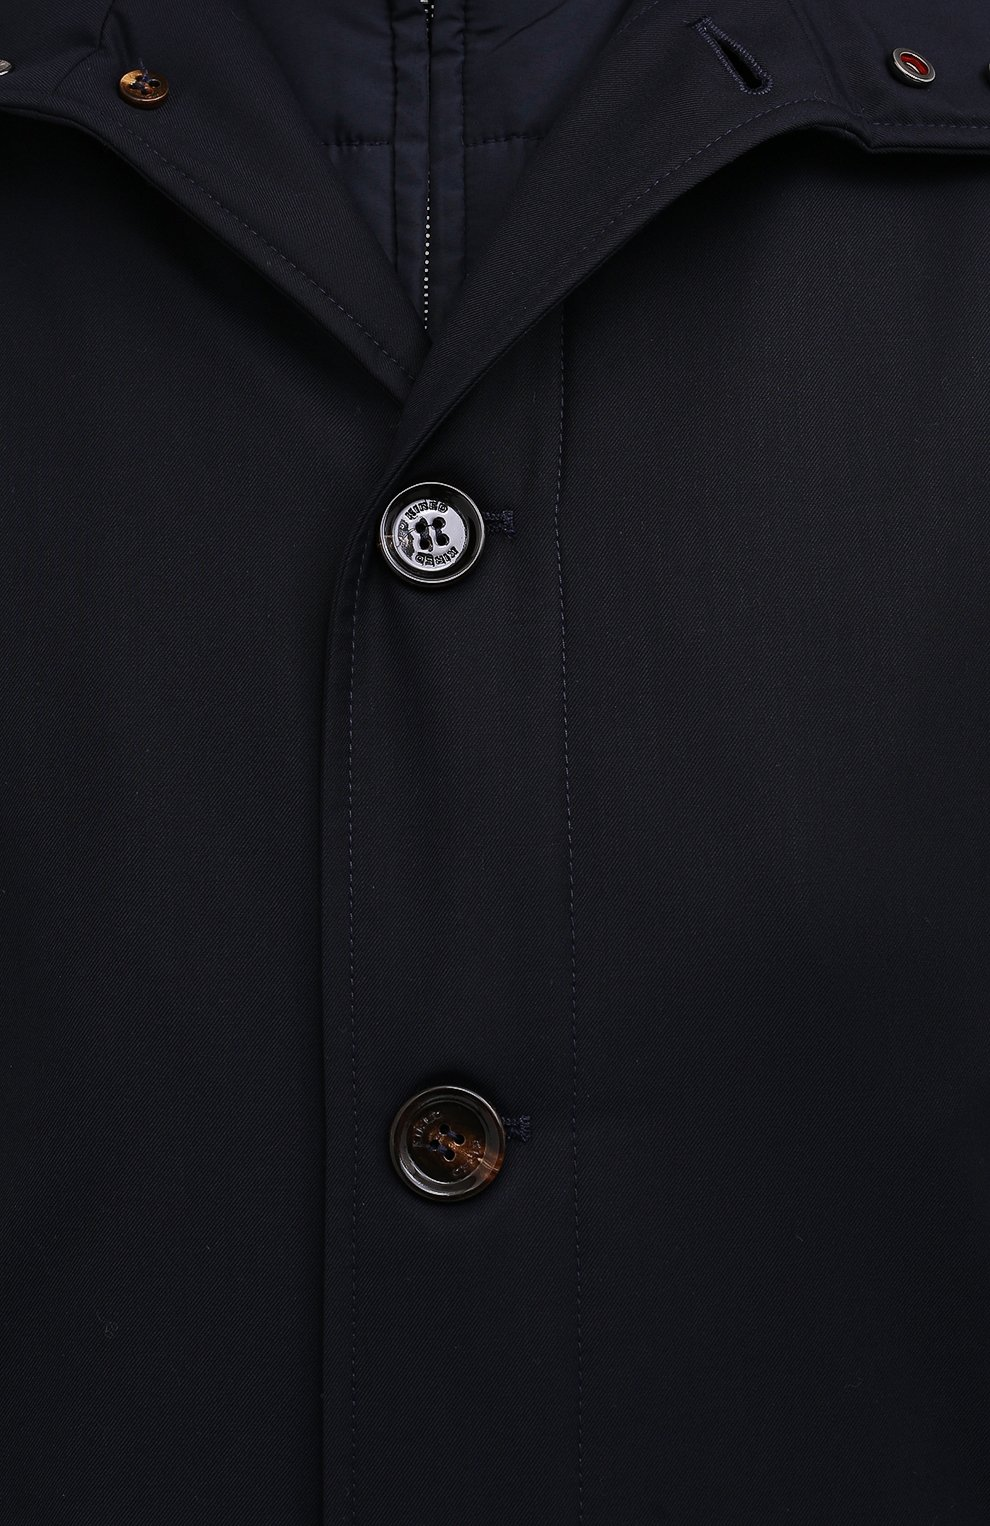 Мужской утепленный плащ KIRED темно-синего цвета, арт. WP0RDW7200002004 | Фото 6